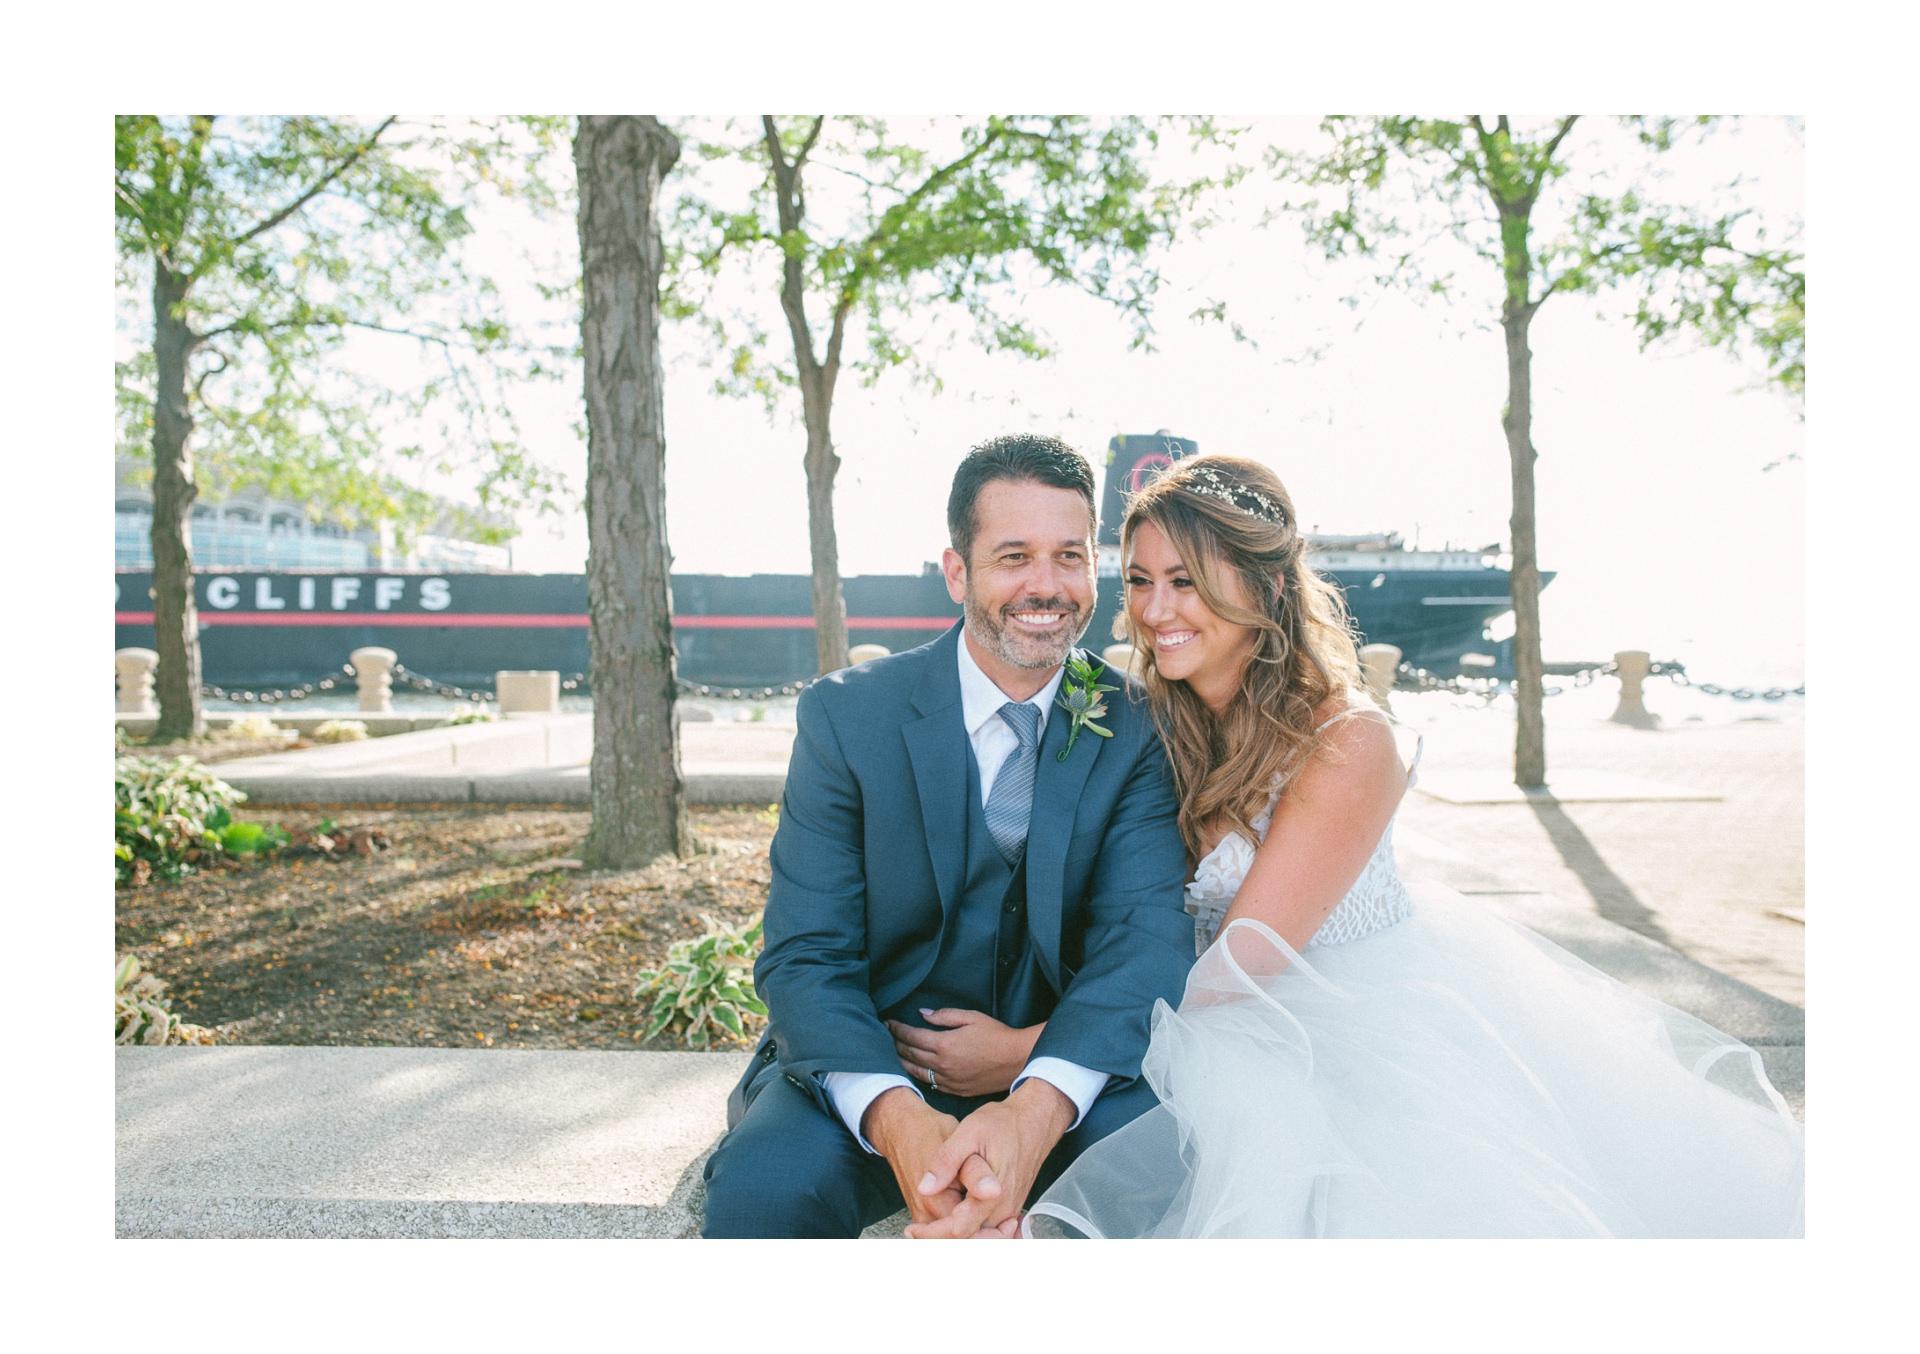 Nuevo Modern Mexican Wedding Photographer in Cleveland 1 36.jpg